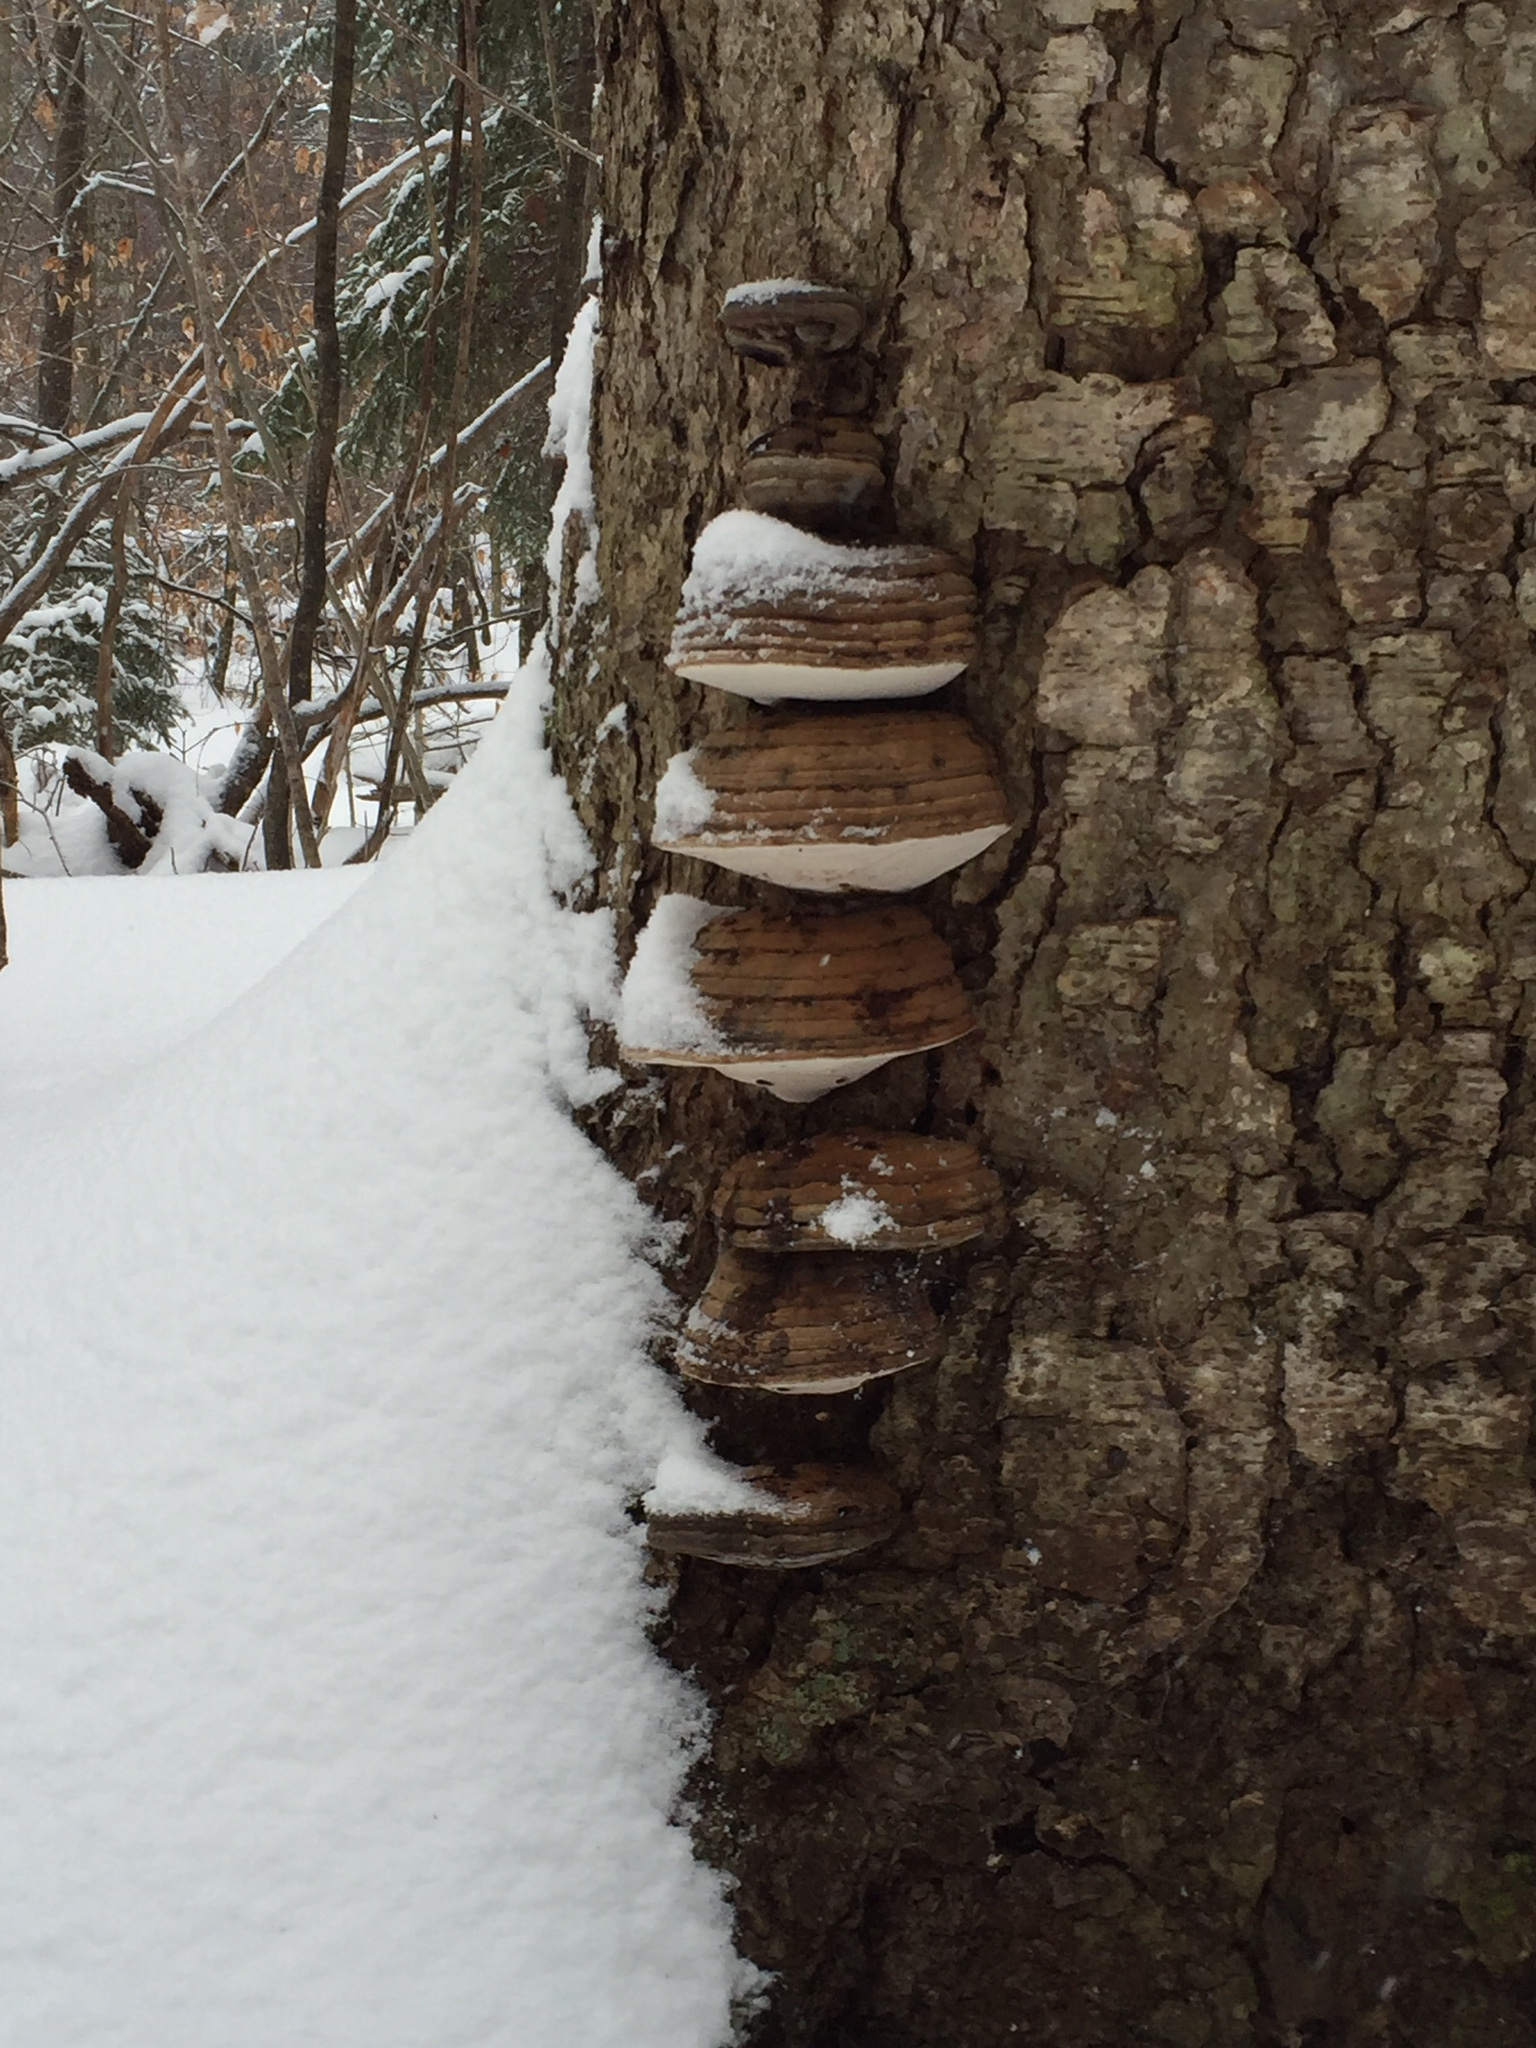 Fungi by Sandy Day